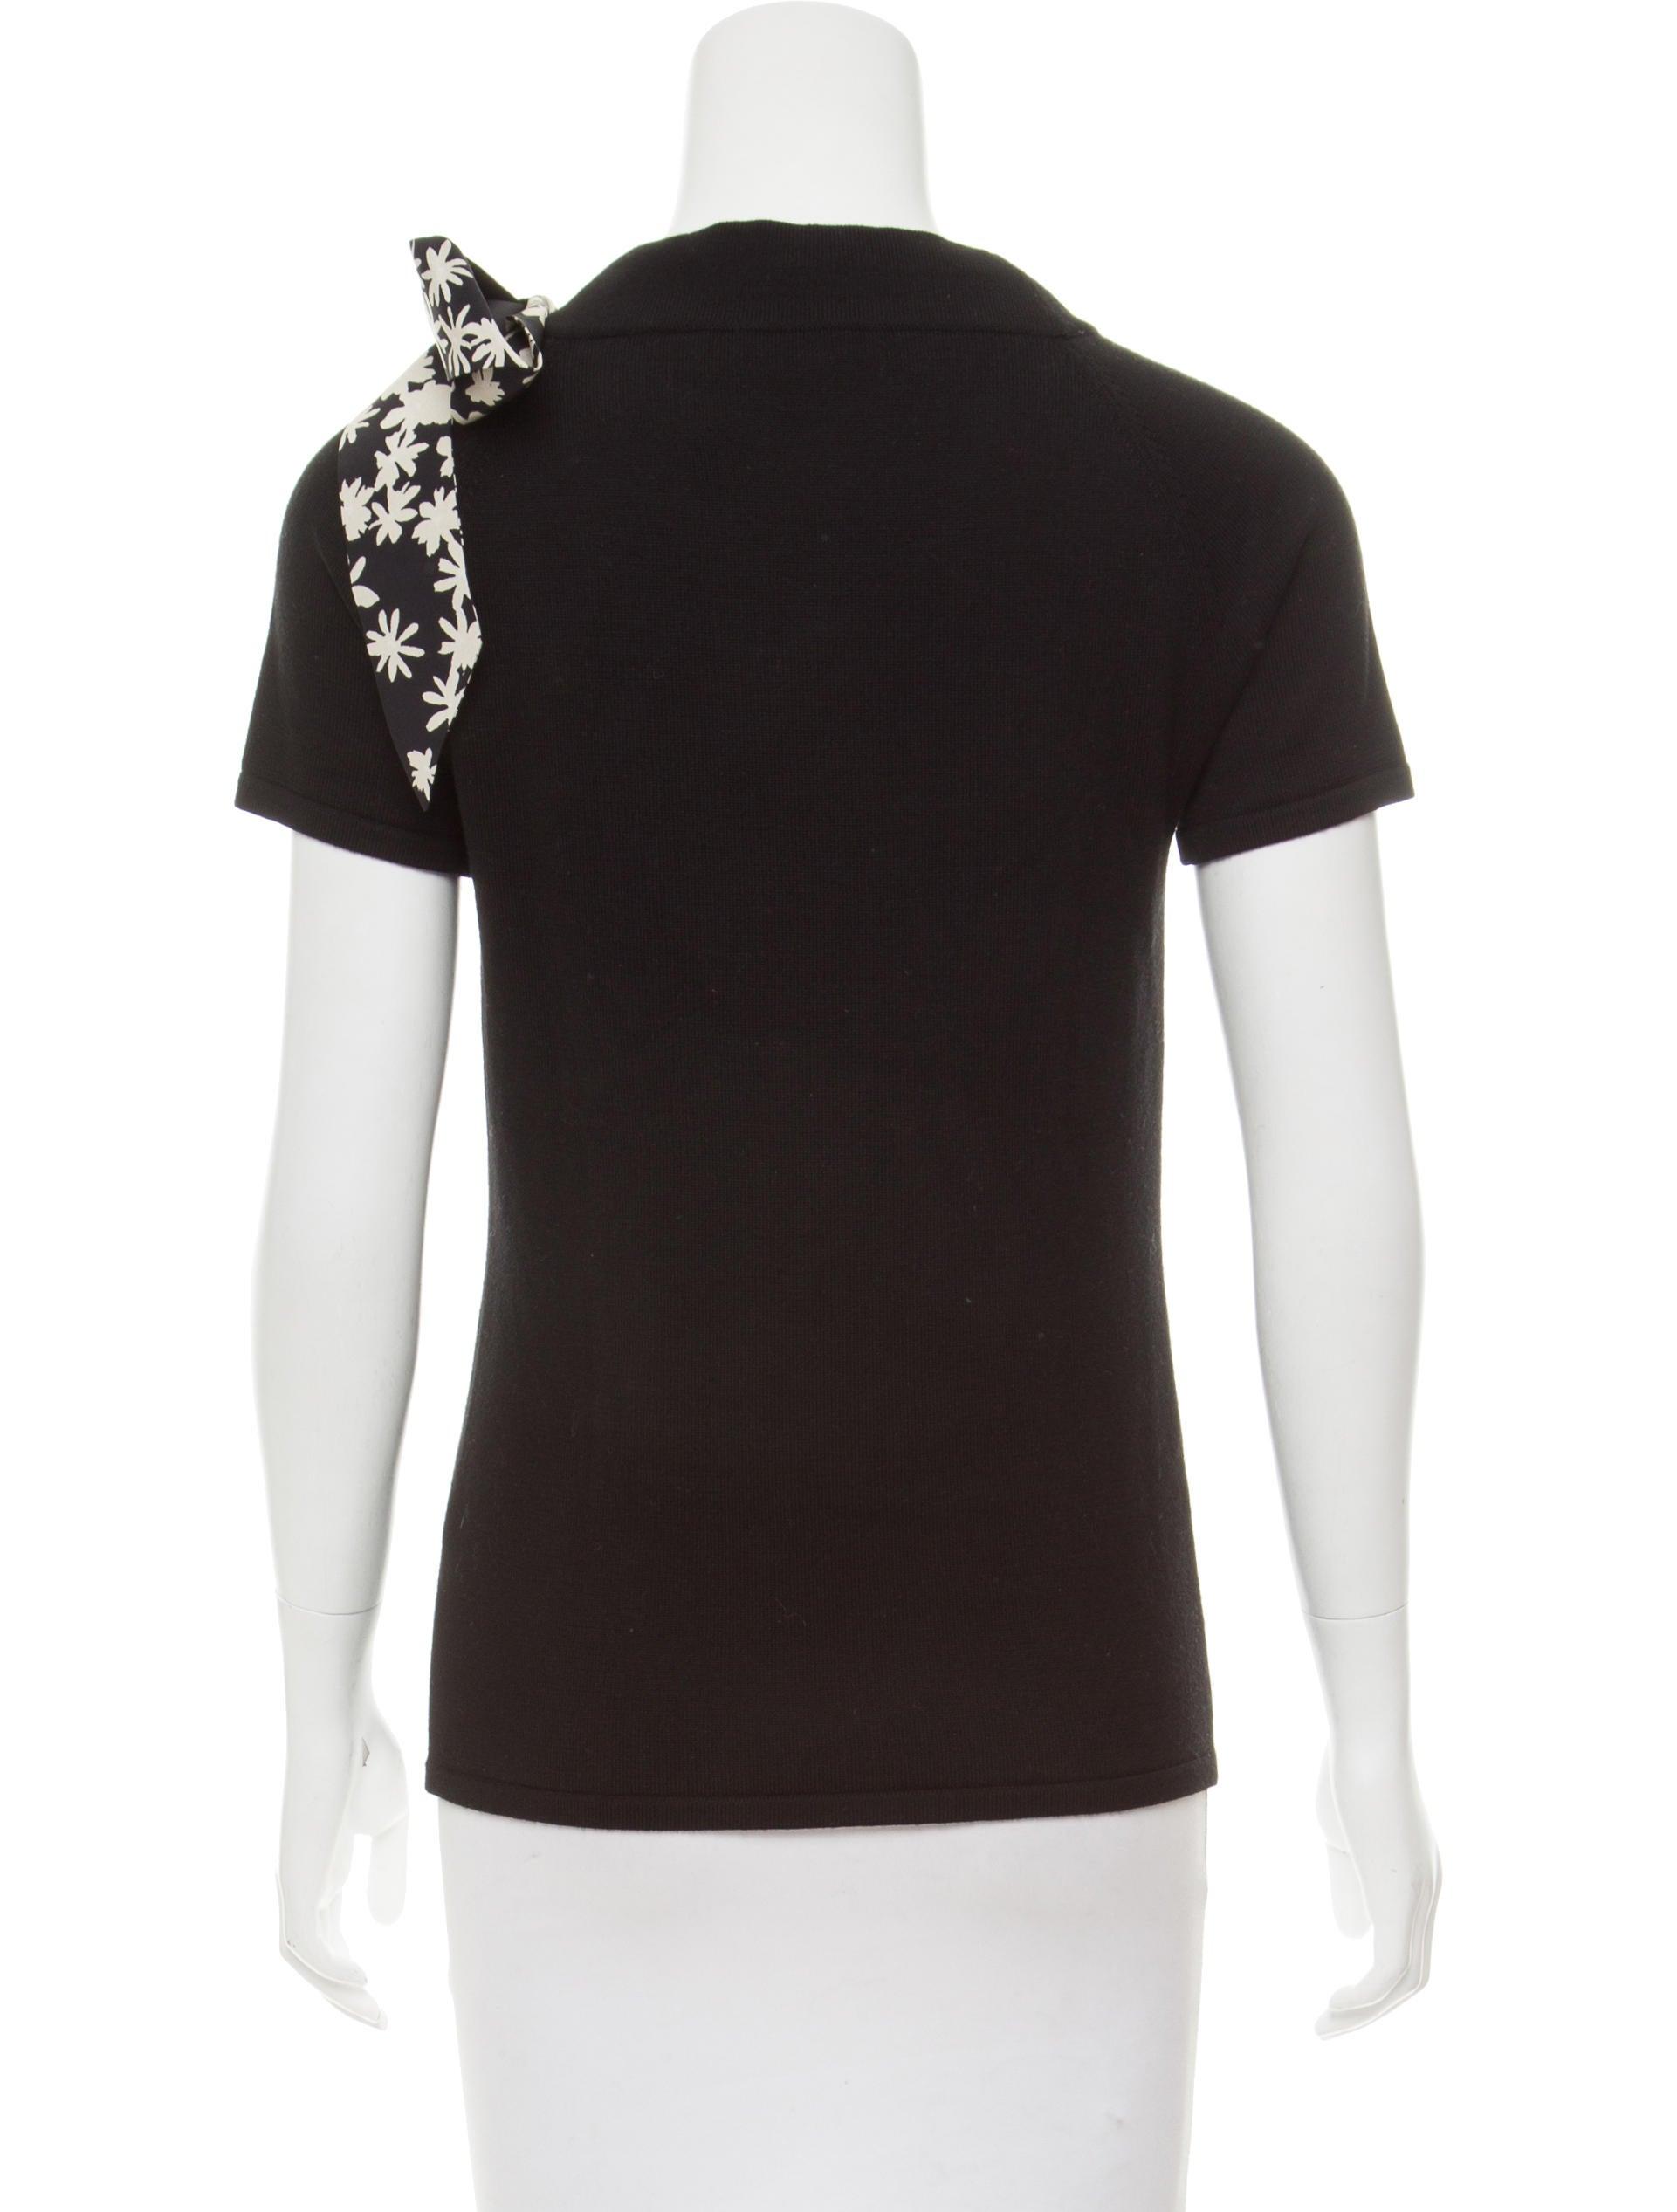 Carolina herrera wool knit top w tags clothing for Best wool shirt jackets